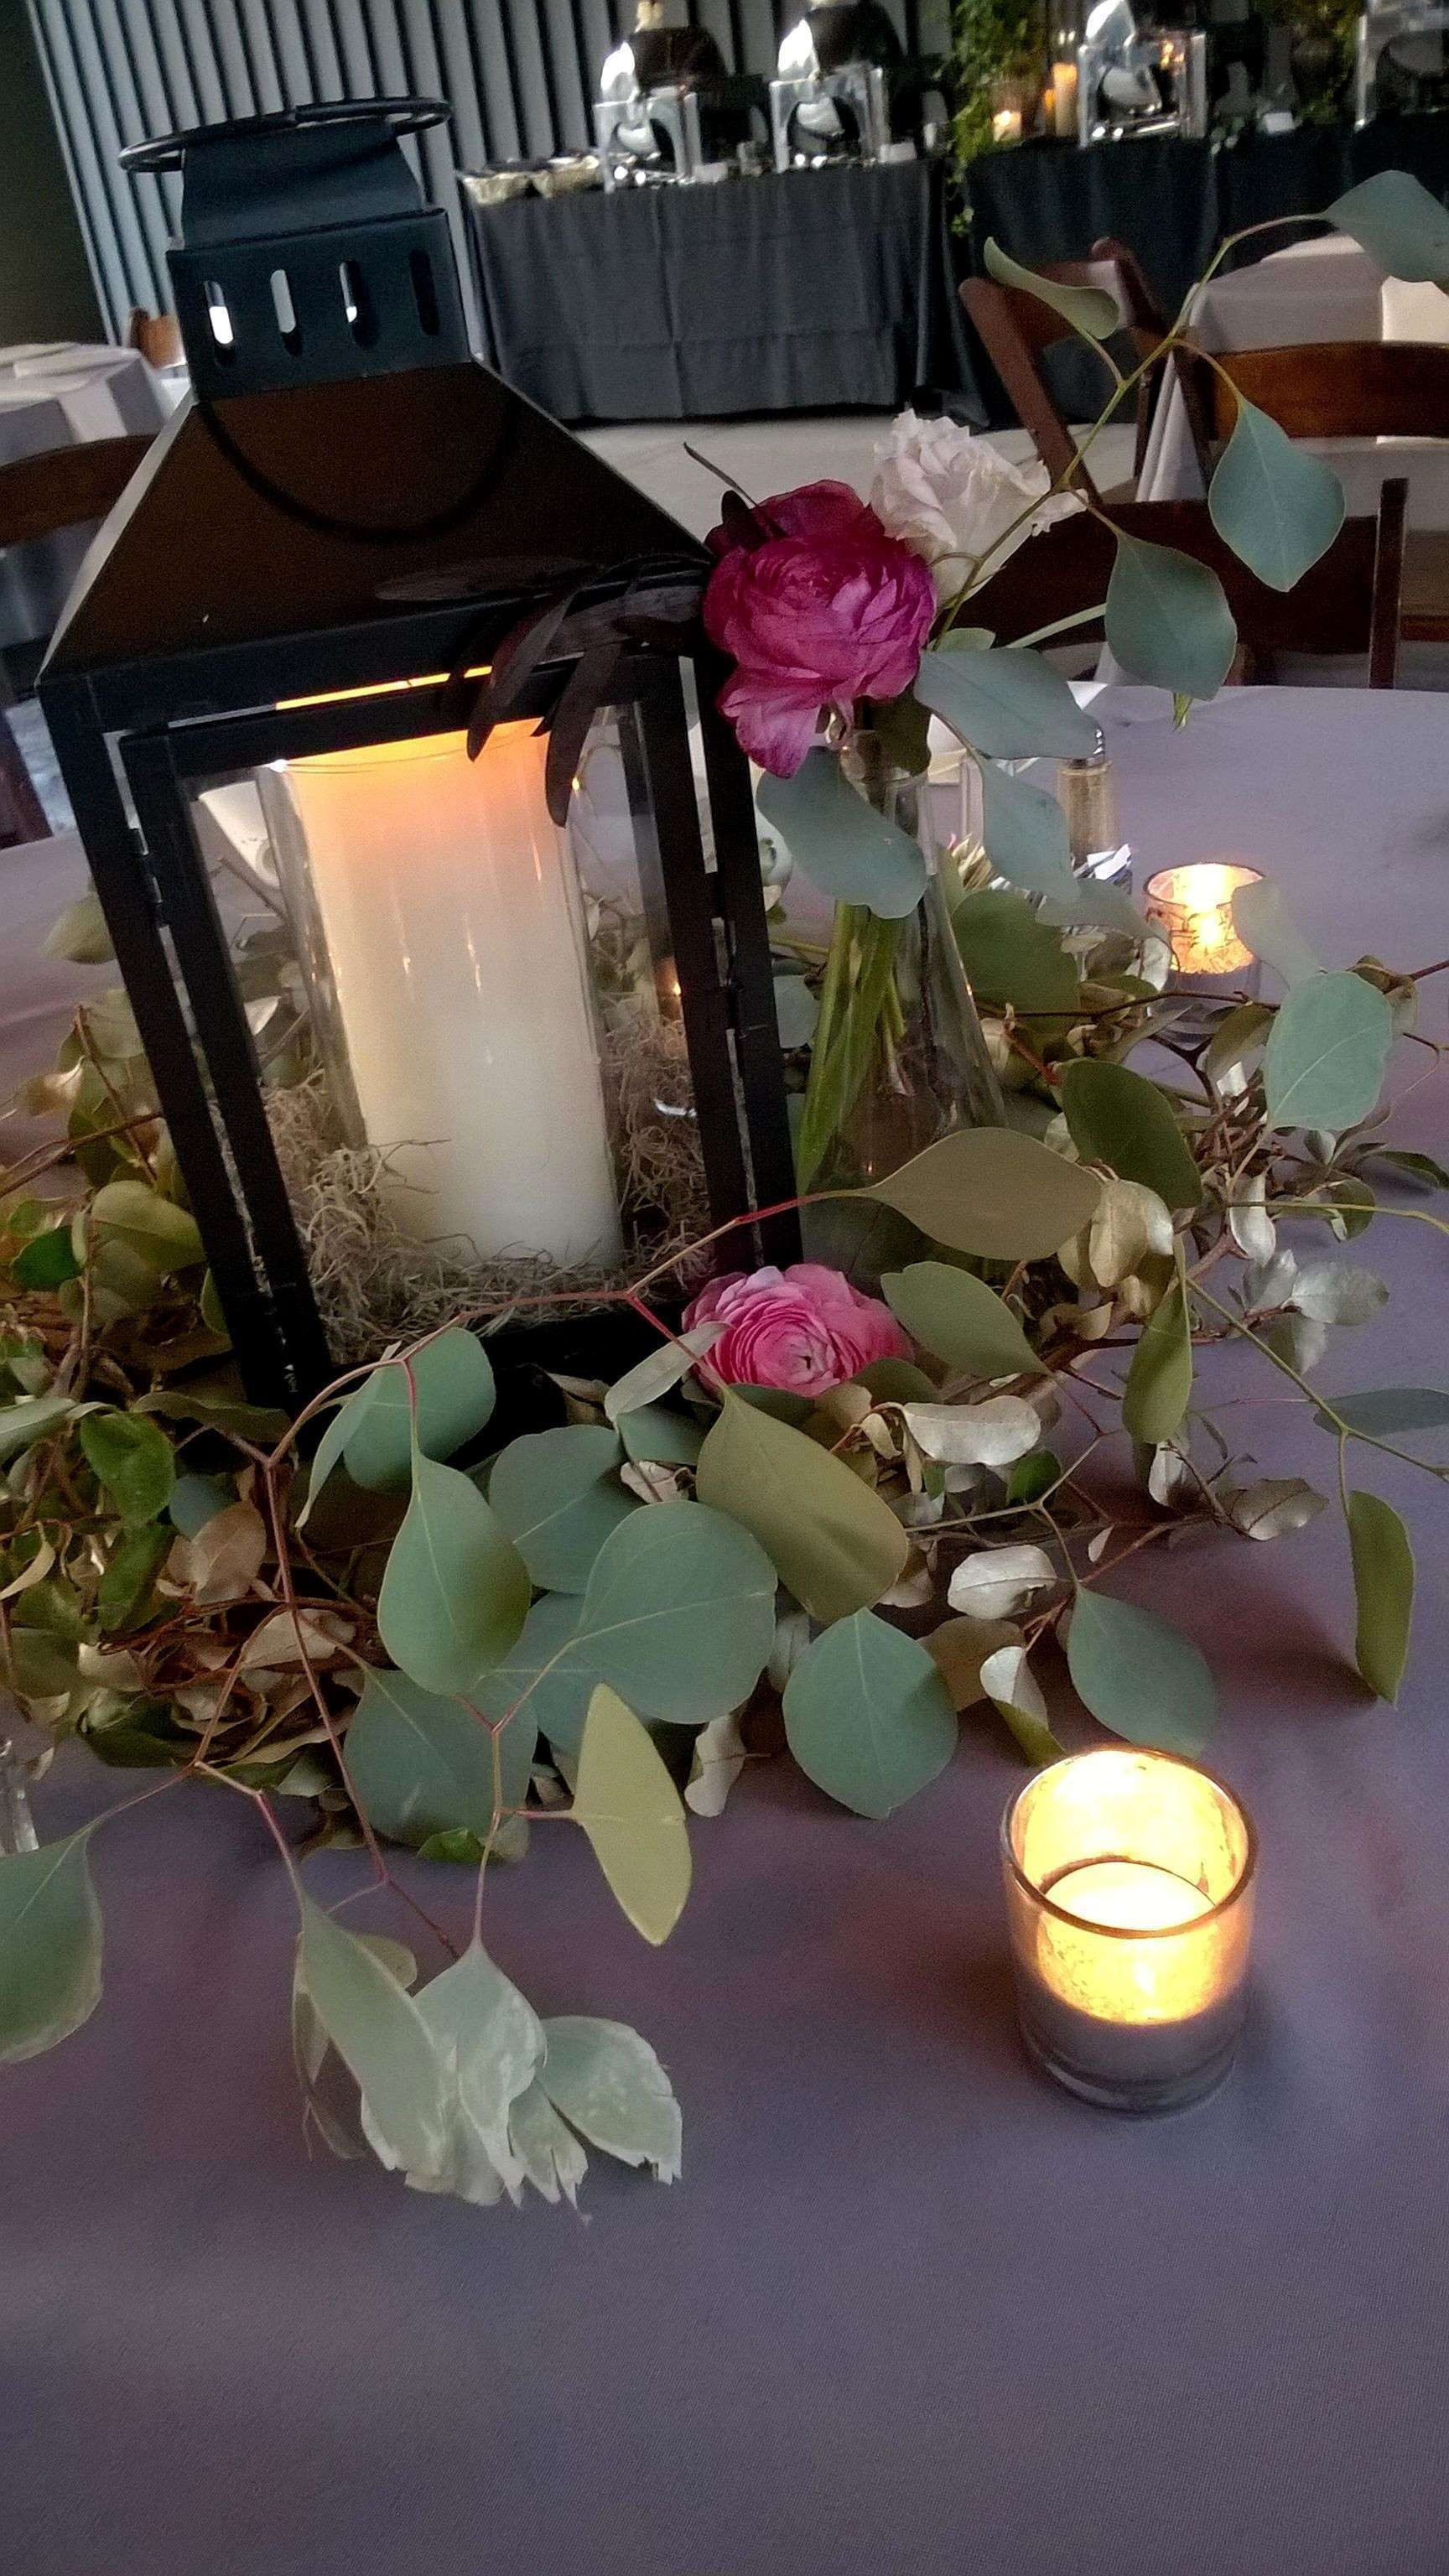 native wedding vase of outdoor wedding decorating ideas best easy wedding decorations within outdoor wedding decorating ideas best easy wedding decorations